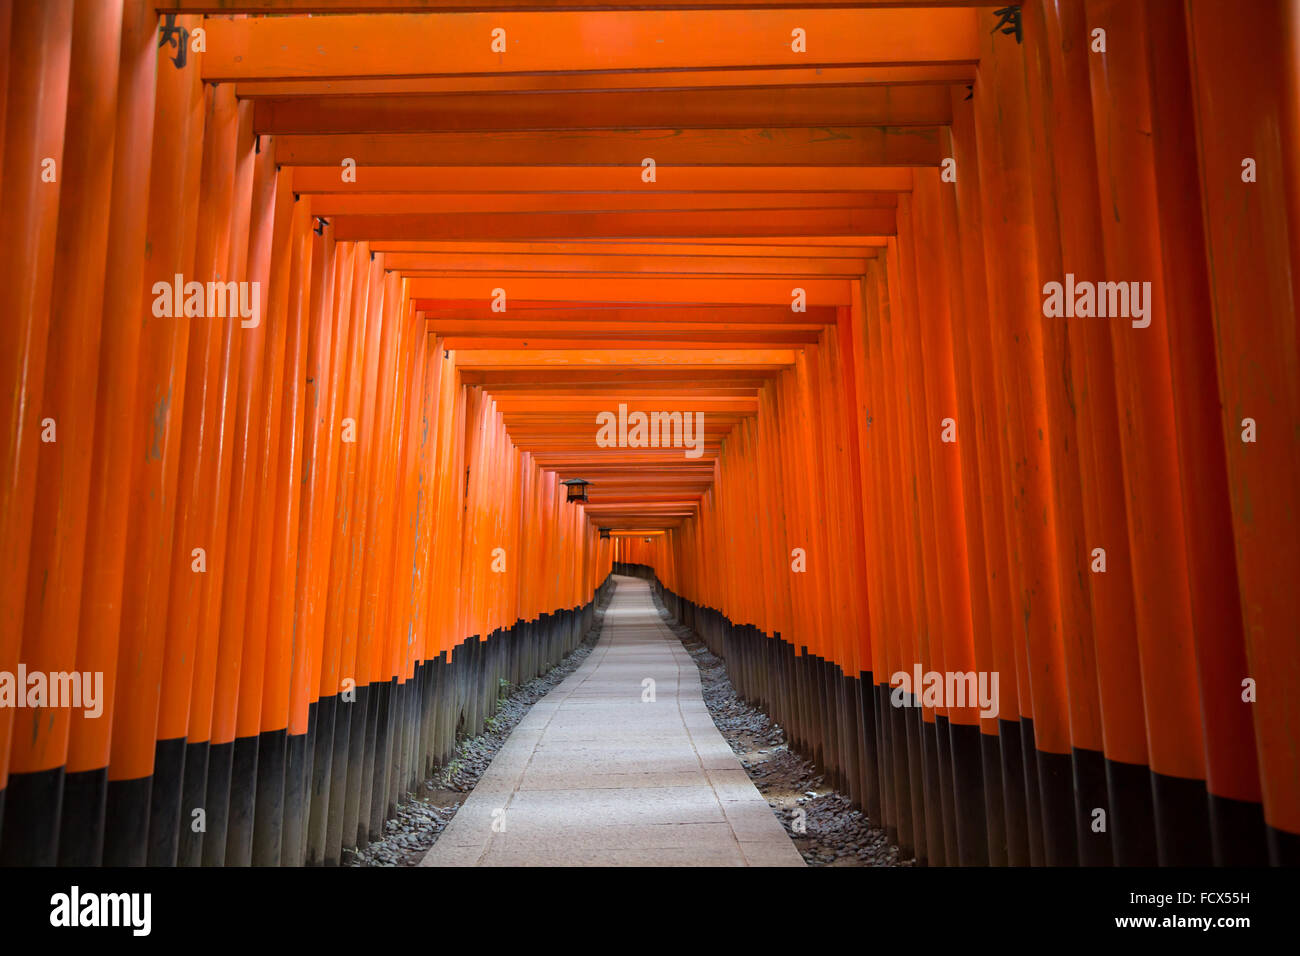 Temple Shinto japonais à Kyoto - Fushimi Inari Shrine (Fushimi Inari Taisha) Photo Stock